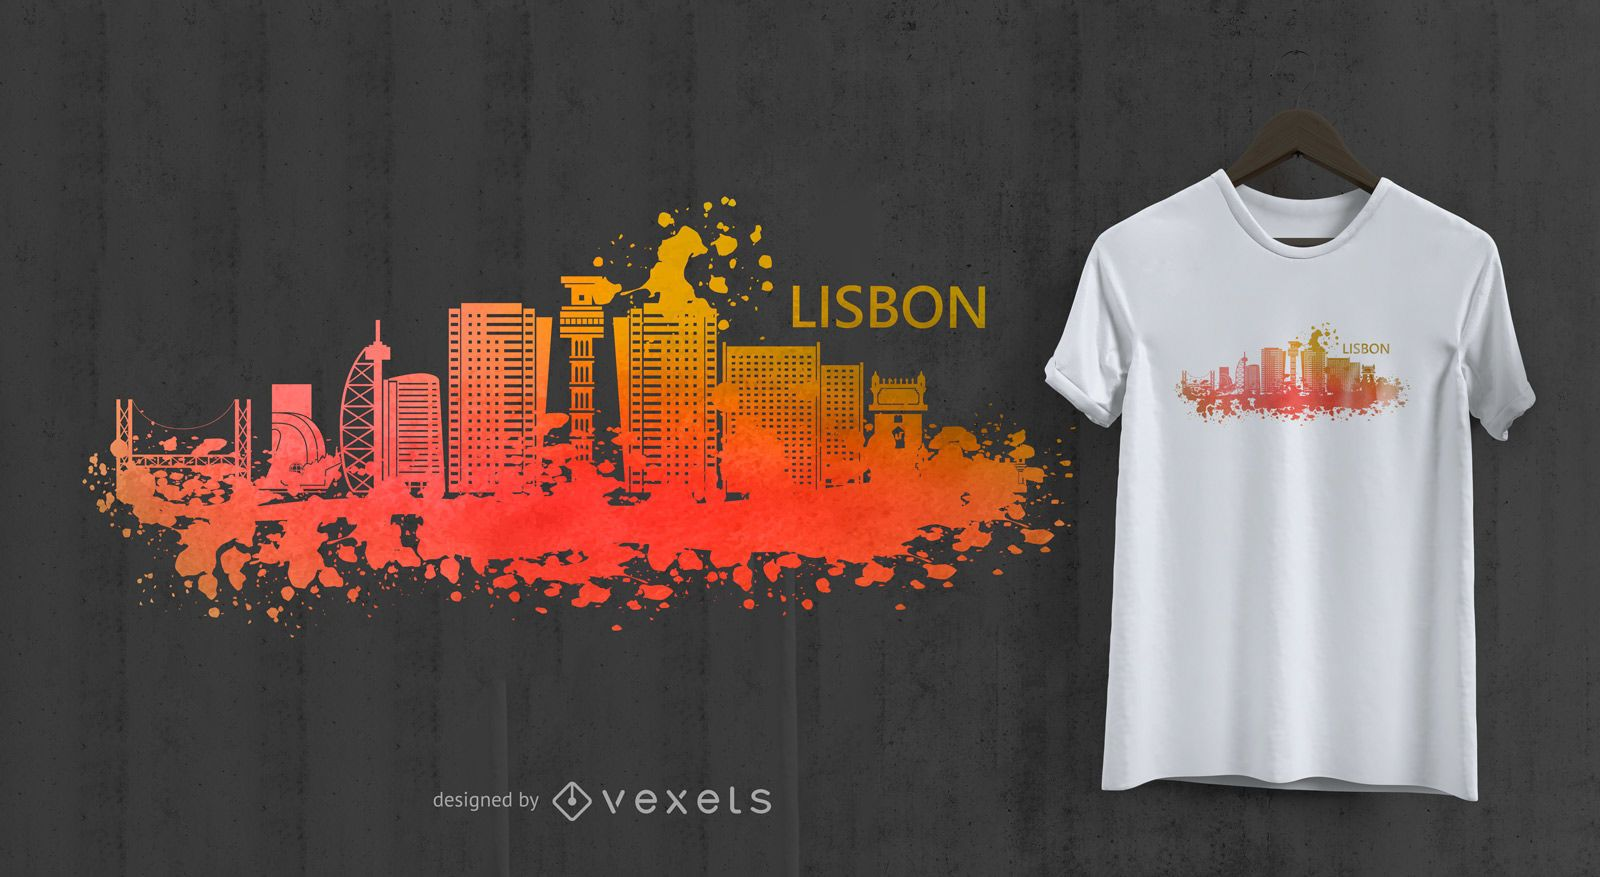 Lisbon watercolor skyline t-shirt design